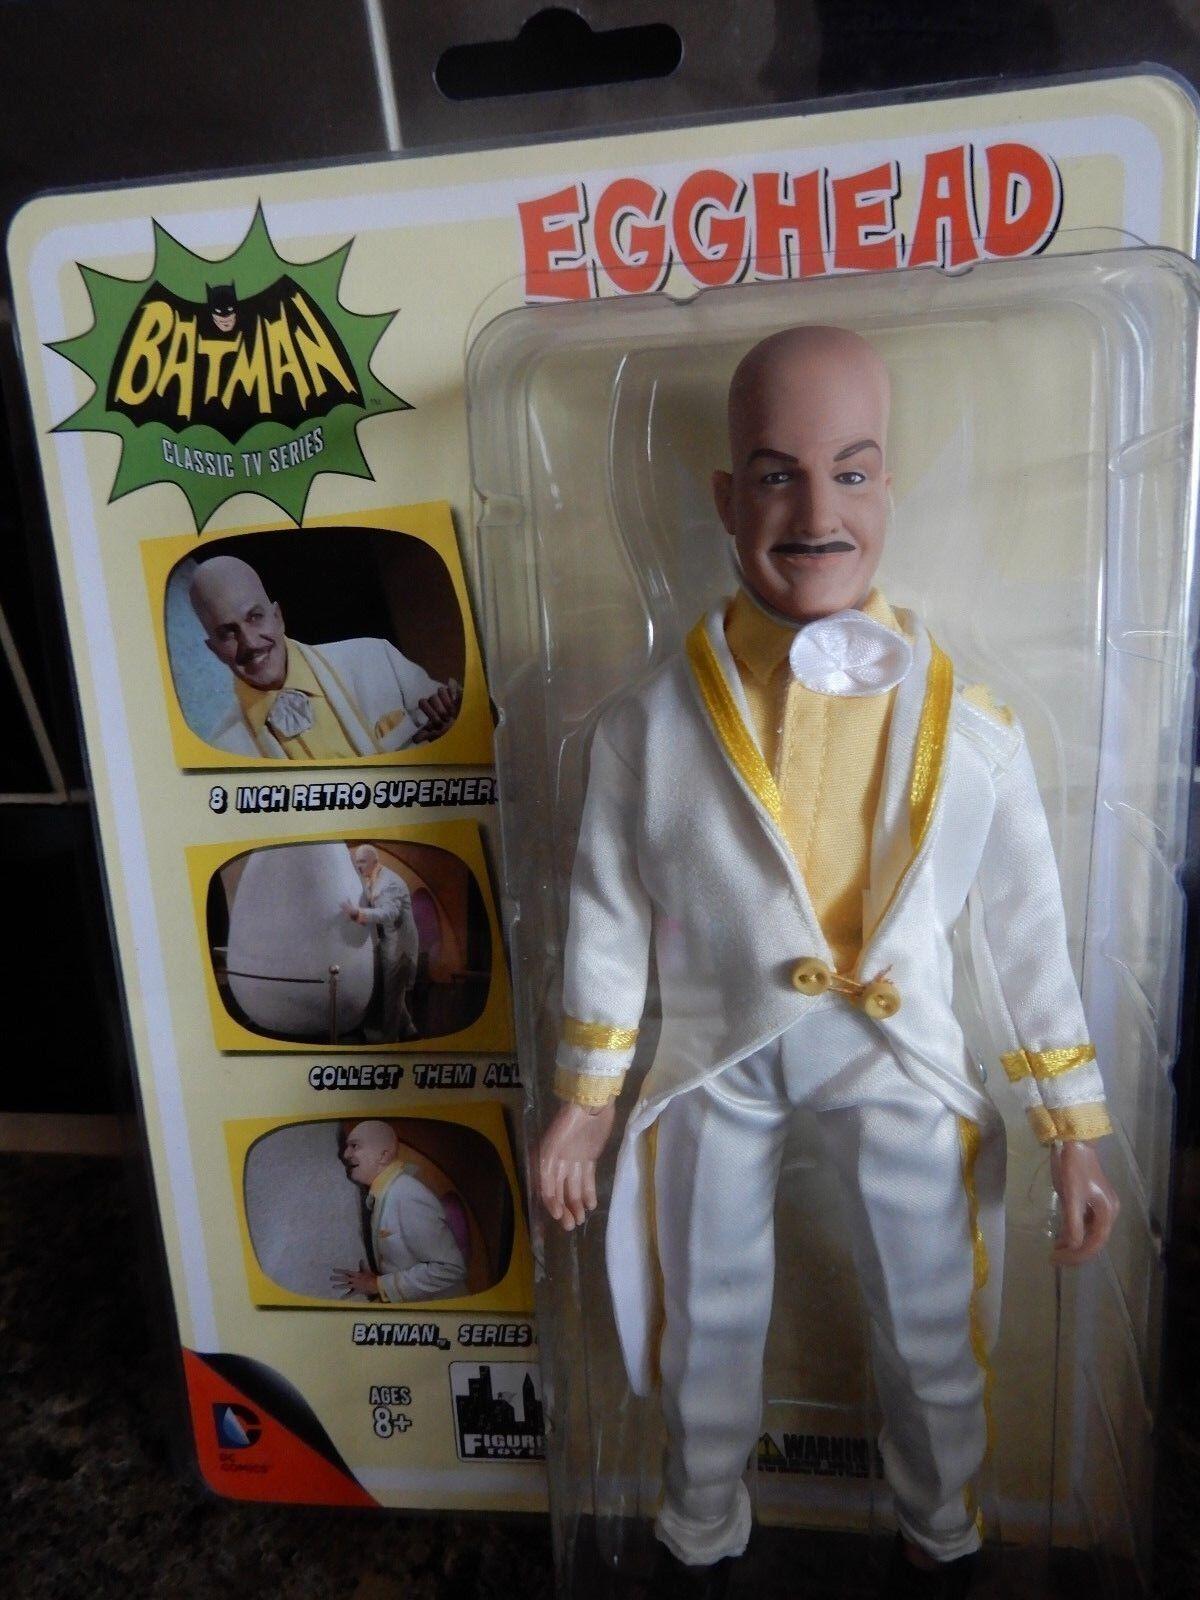 Toy figure co batman classic tv series egg head figure